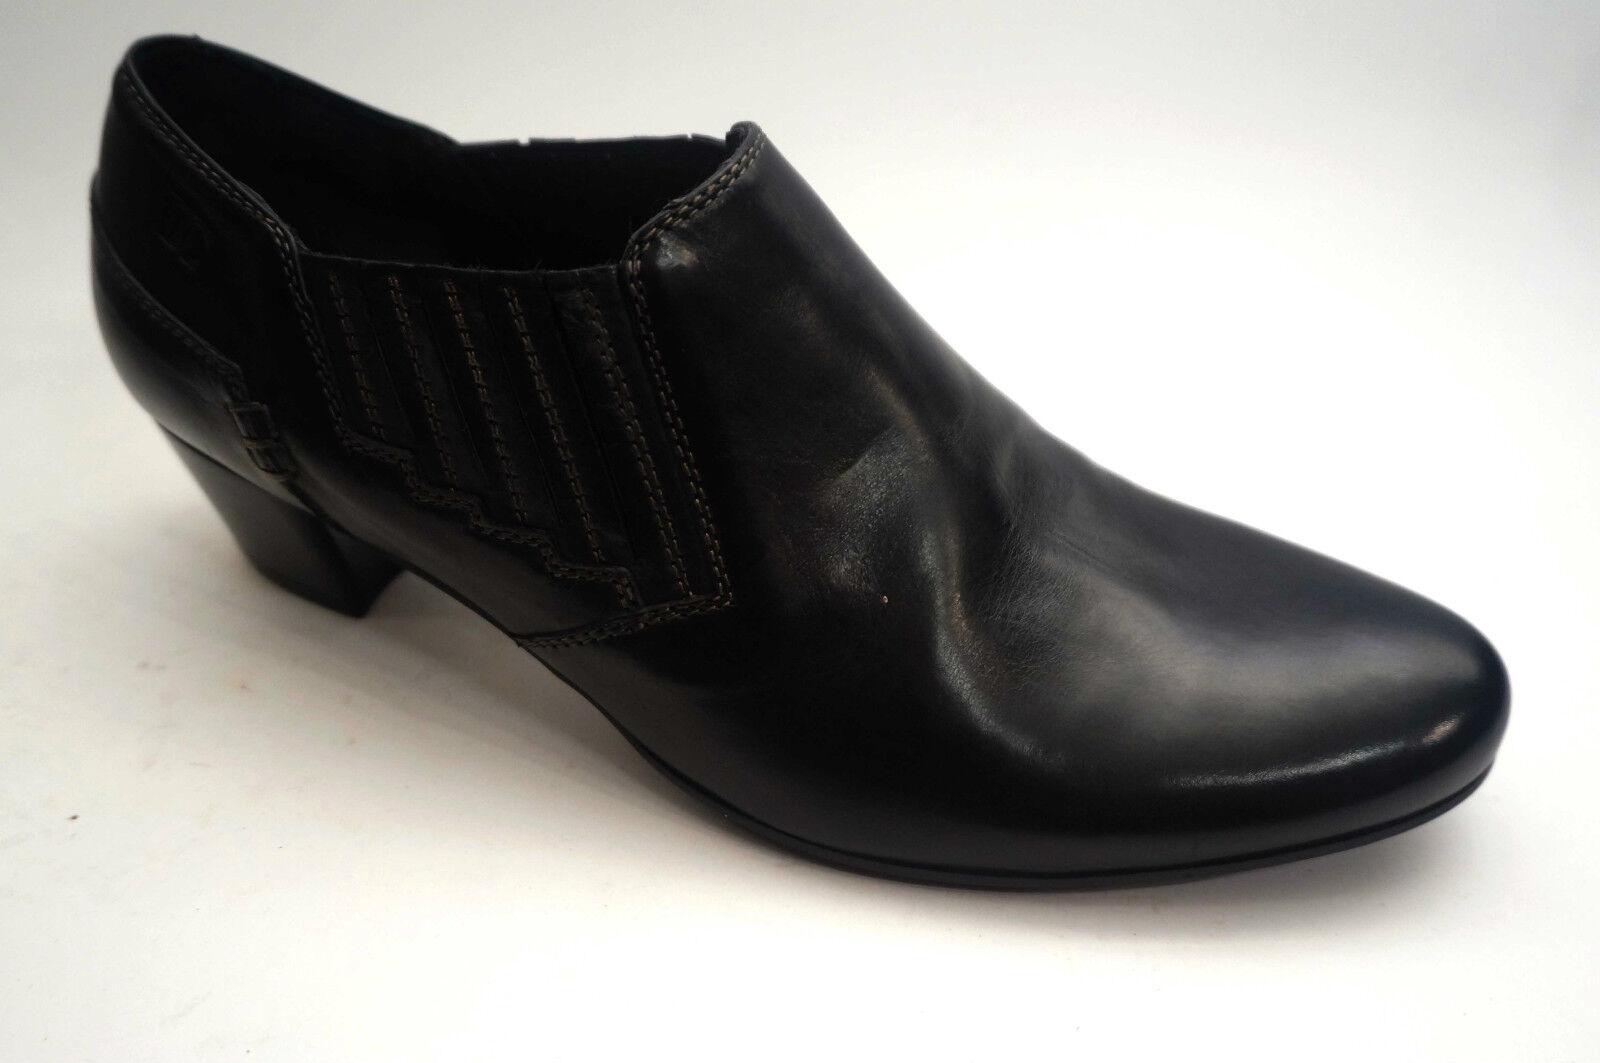 Damenschuhe Carolina Schuhe Hochfront Leder Slipper Größe 36,5  ( UK 3,5 ) Schwarz